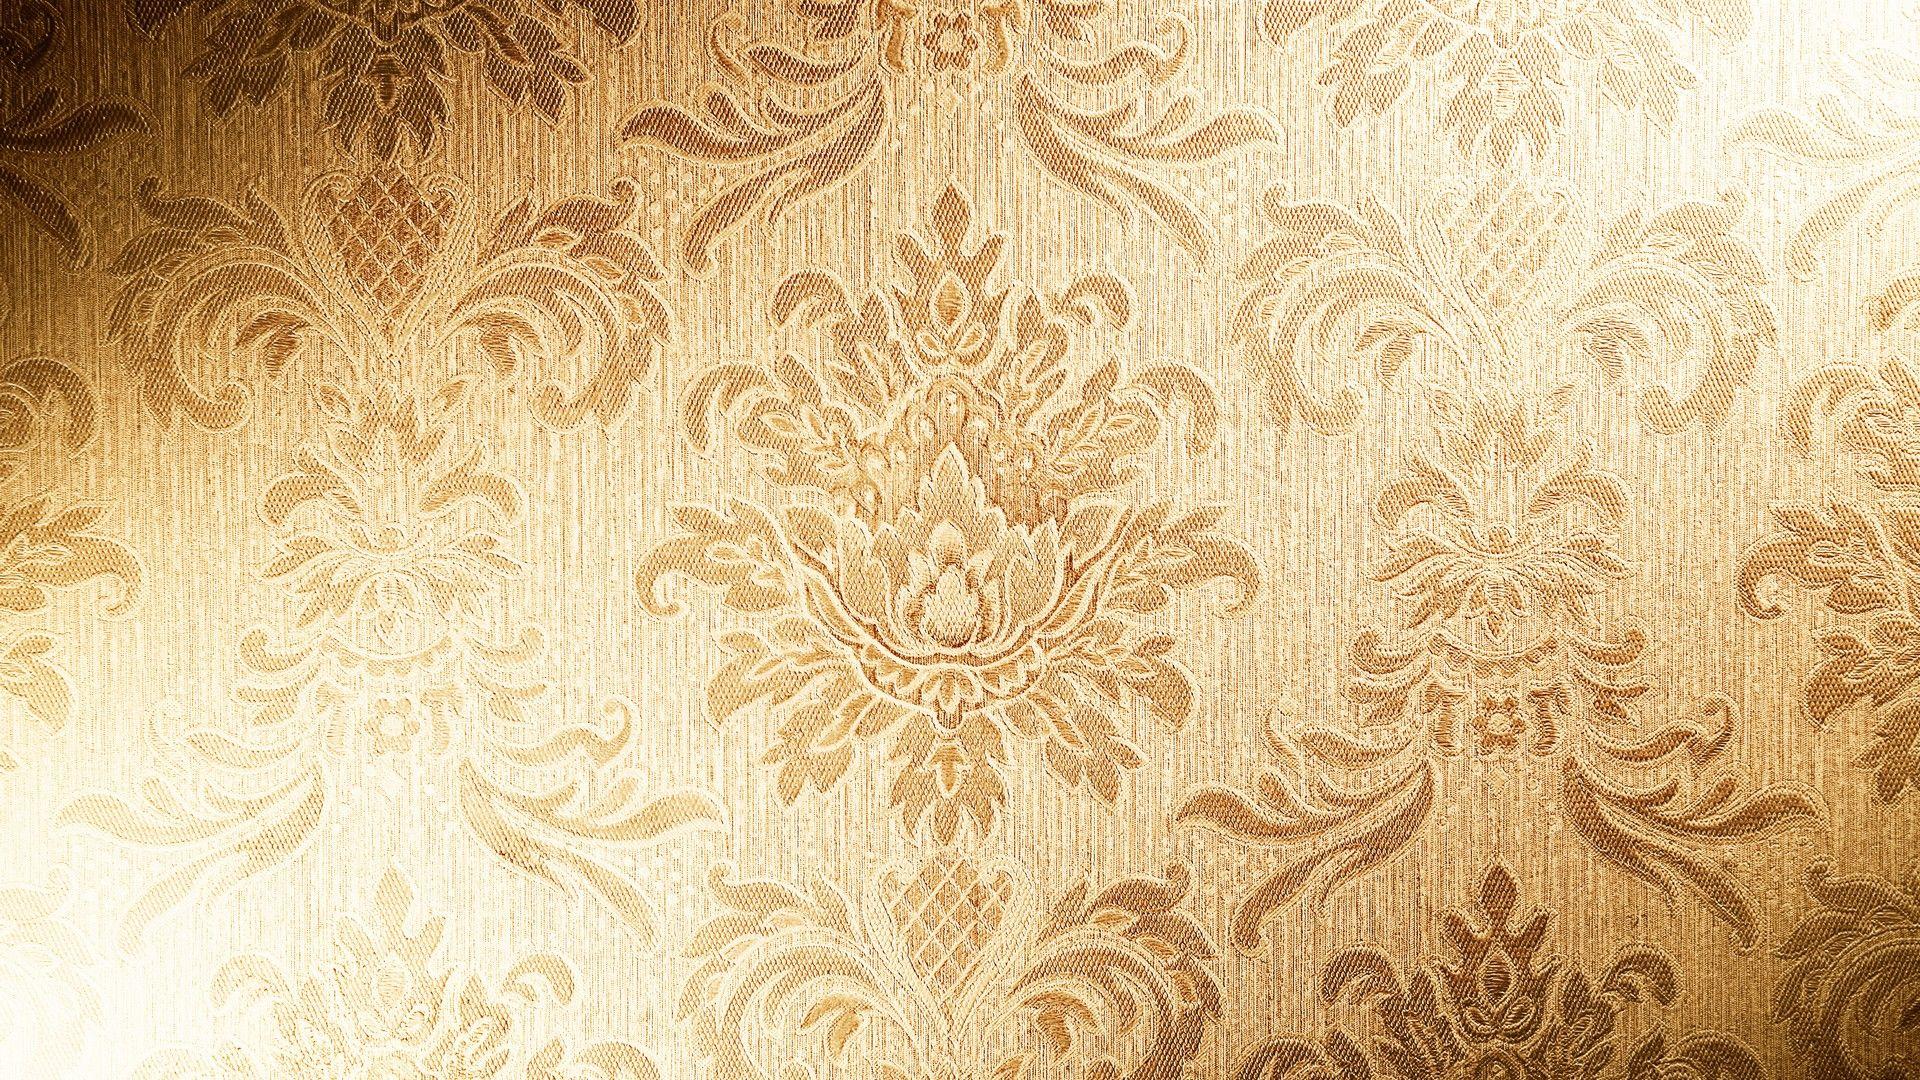 Wallpaper Gold Designs Hd 2020 Live Wallpaper Hd Vintage Gold Wallpaper Wallpaper Wallpapers Vintage